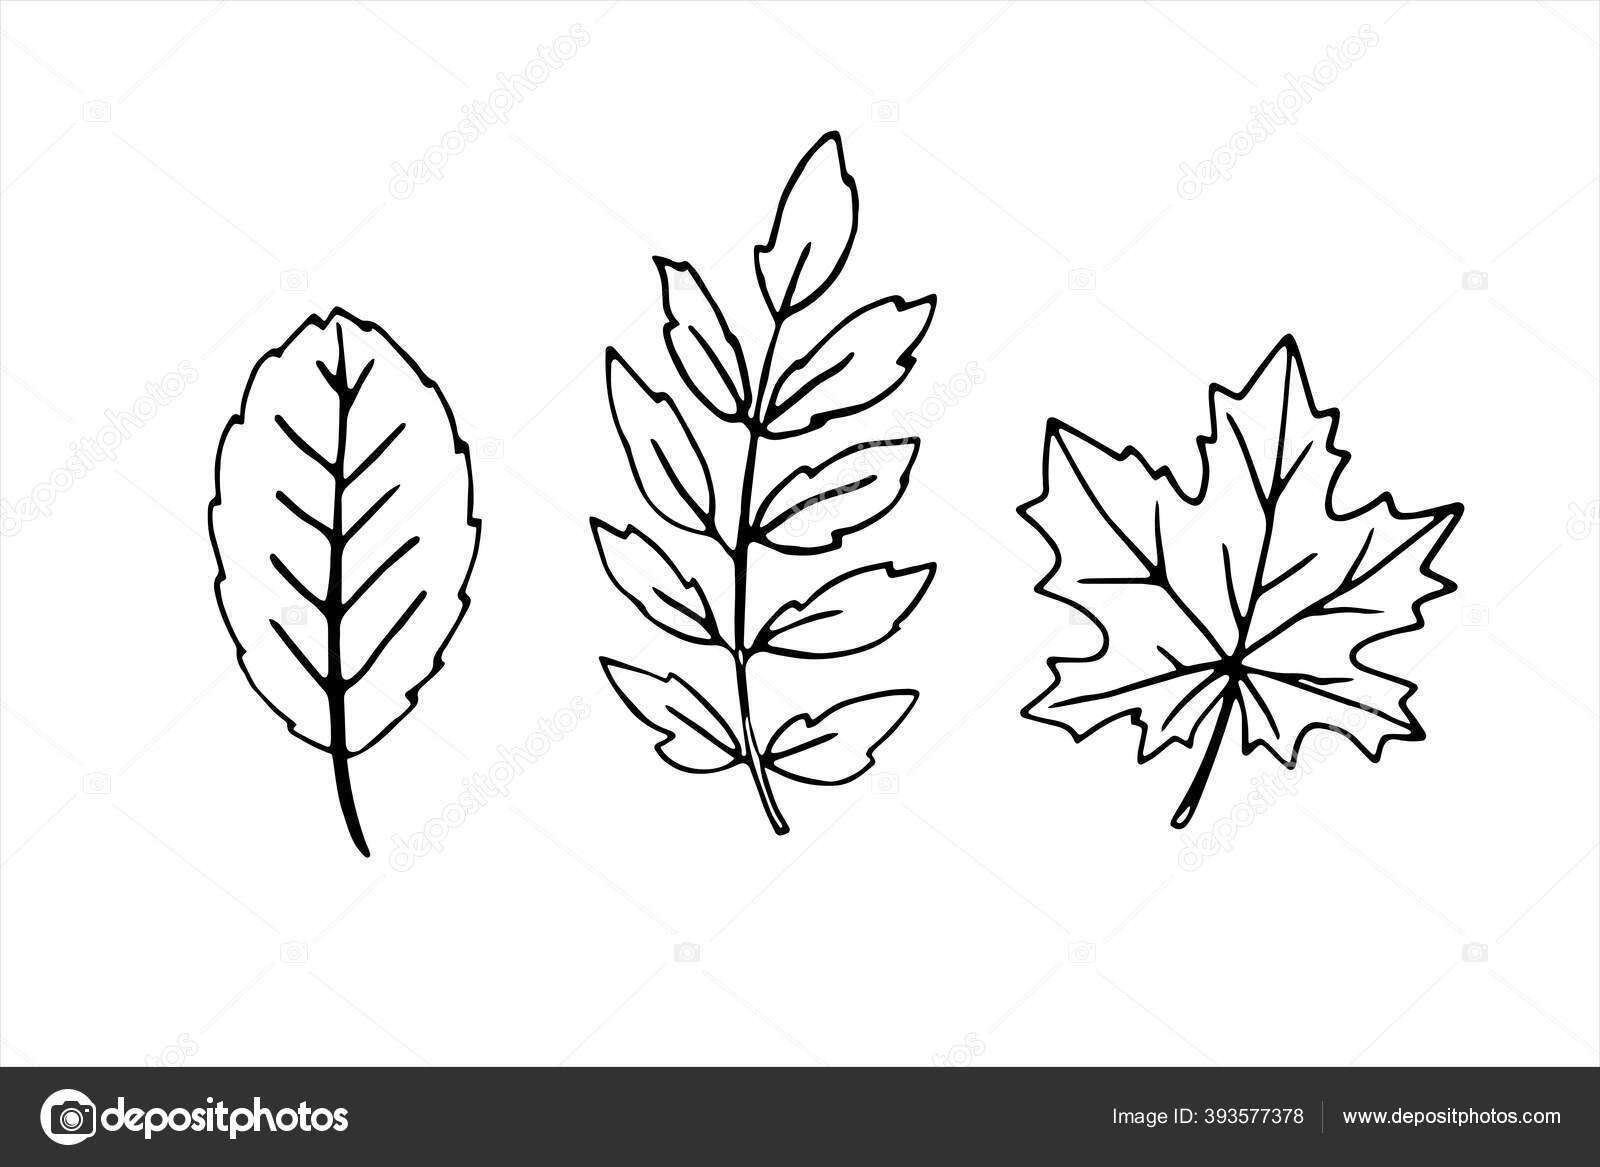 Gambar Daun Hitam Putih Vector Tips Dan Trik Pertanian